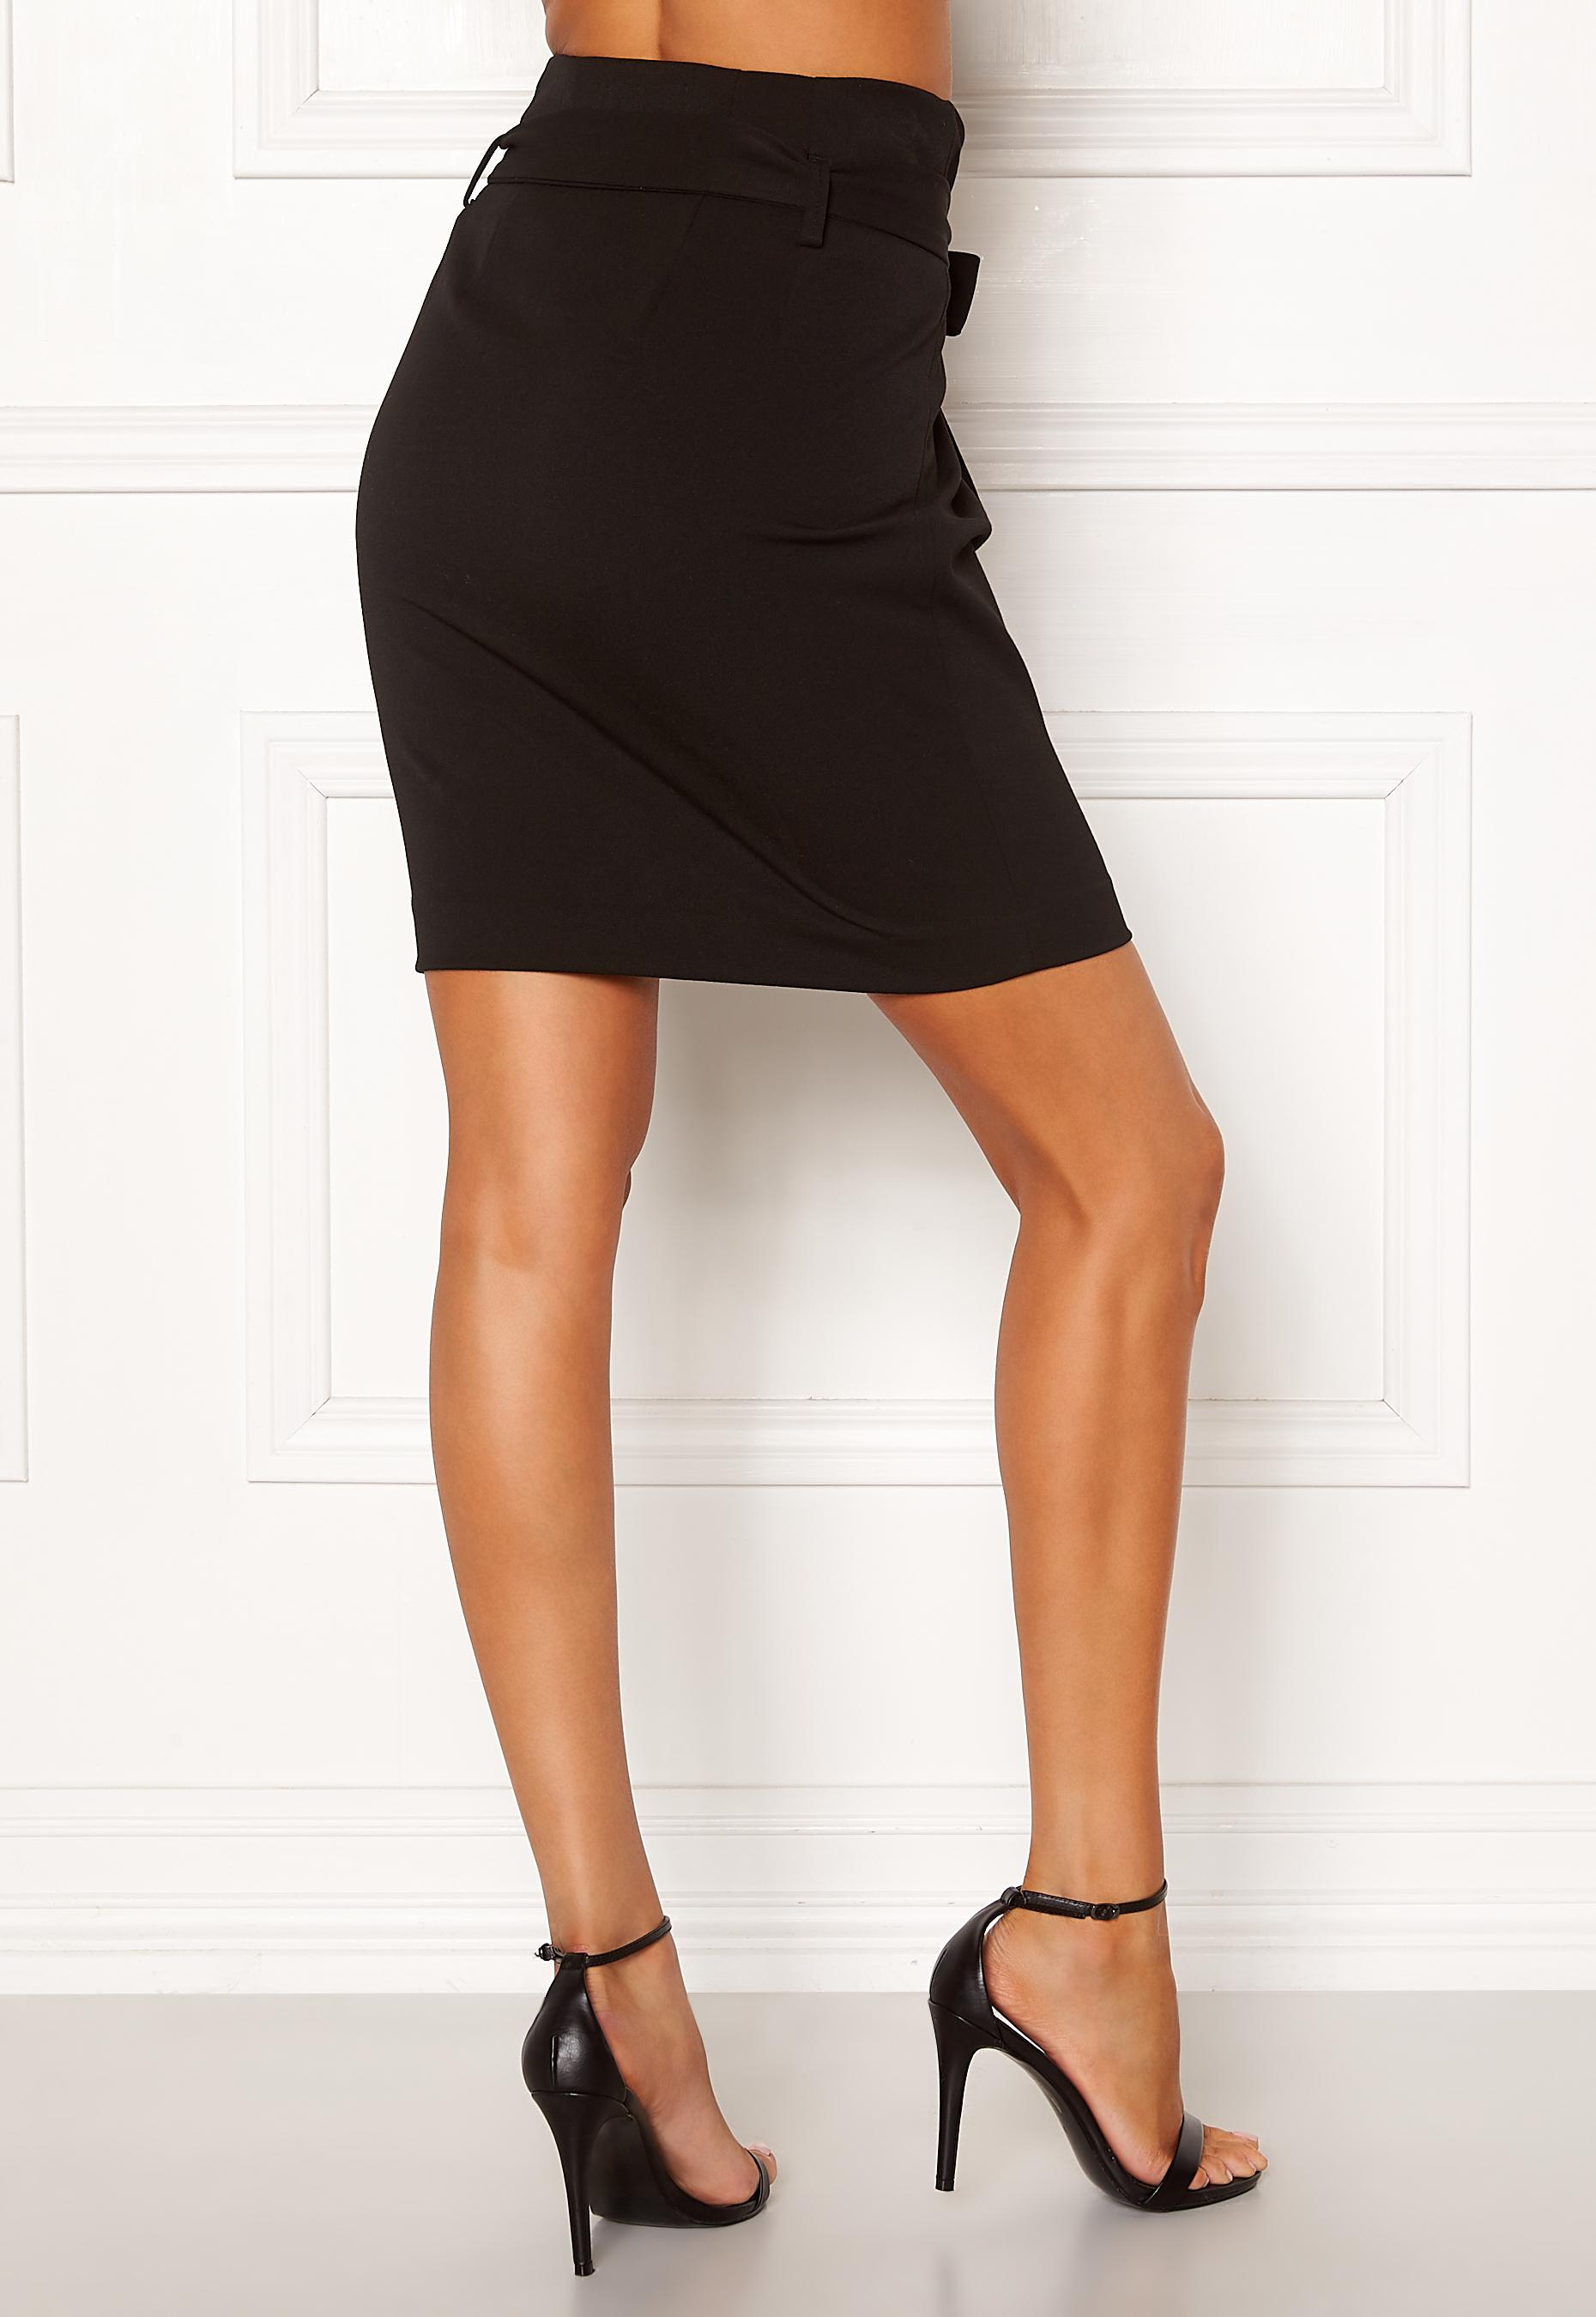 c9f32b27 OBJECT Lisa Abella Mini Skirt Black - Bubbleroom